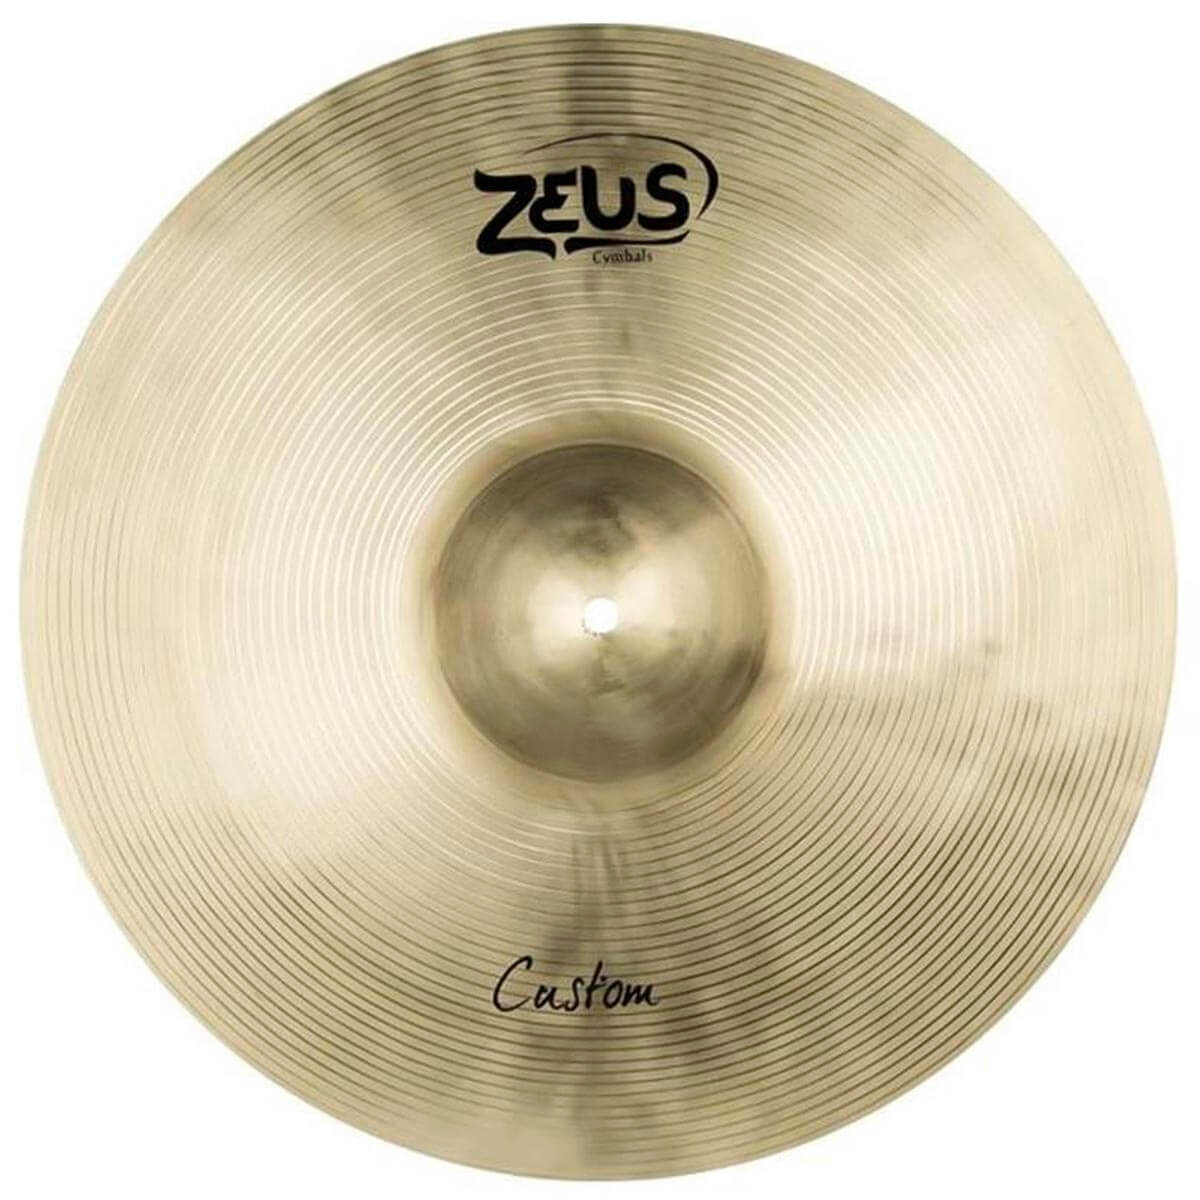 Prato de Efeito Zeus Cymbals Custom Series ZCS8 8